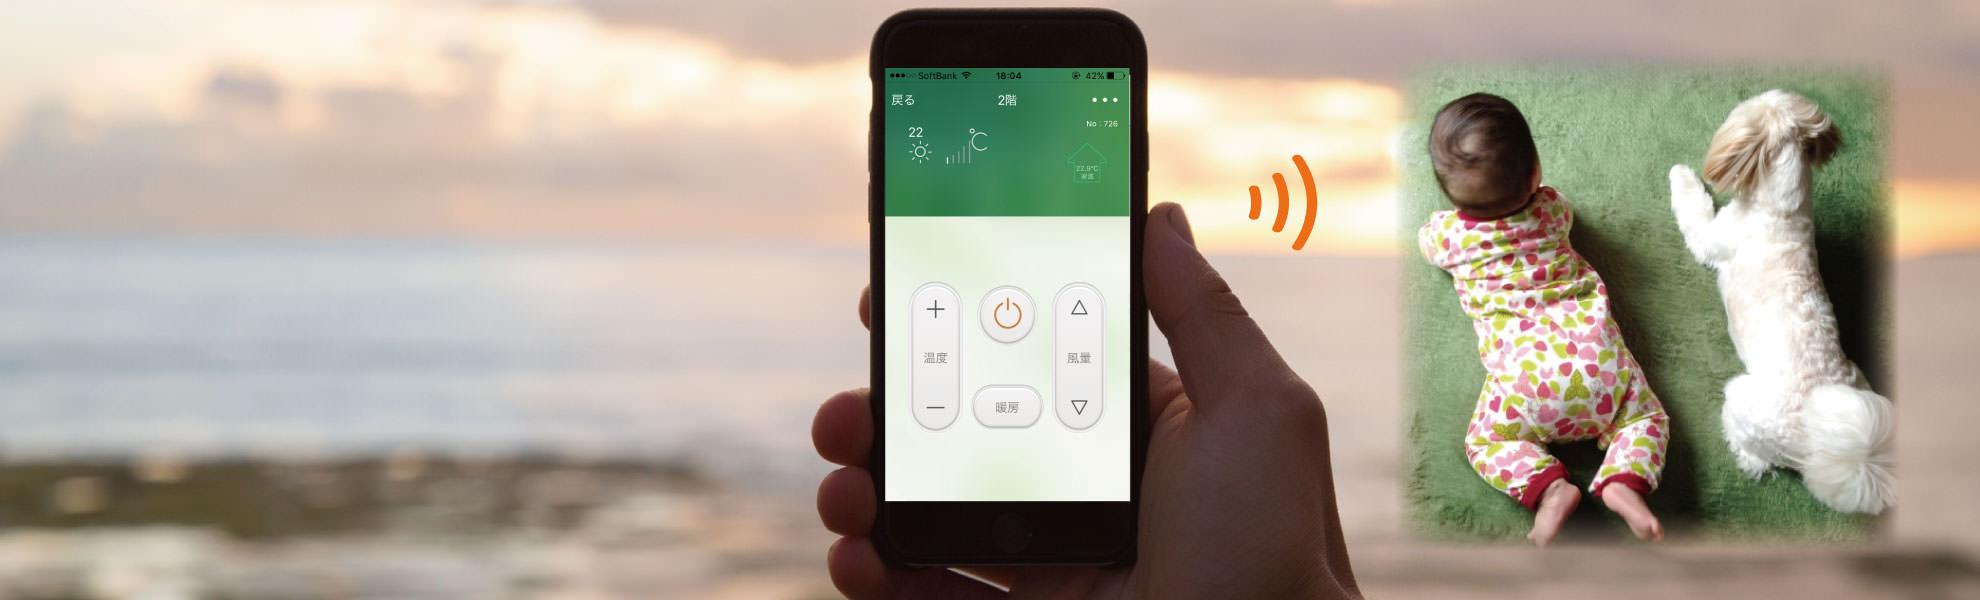 eRemote|IoT 家電 スマートホーム・スマートハウス|Link Japan画像03